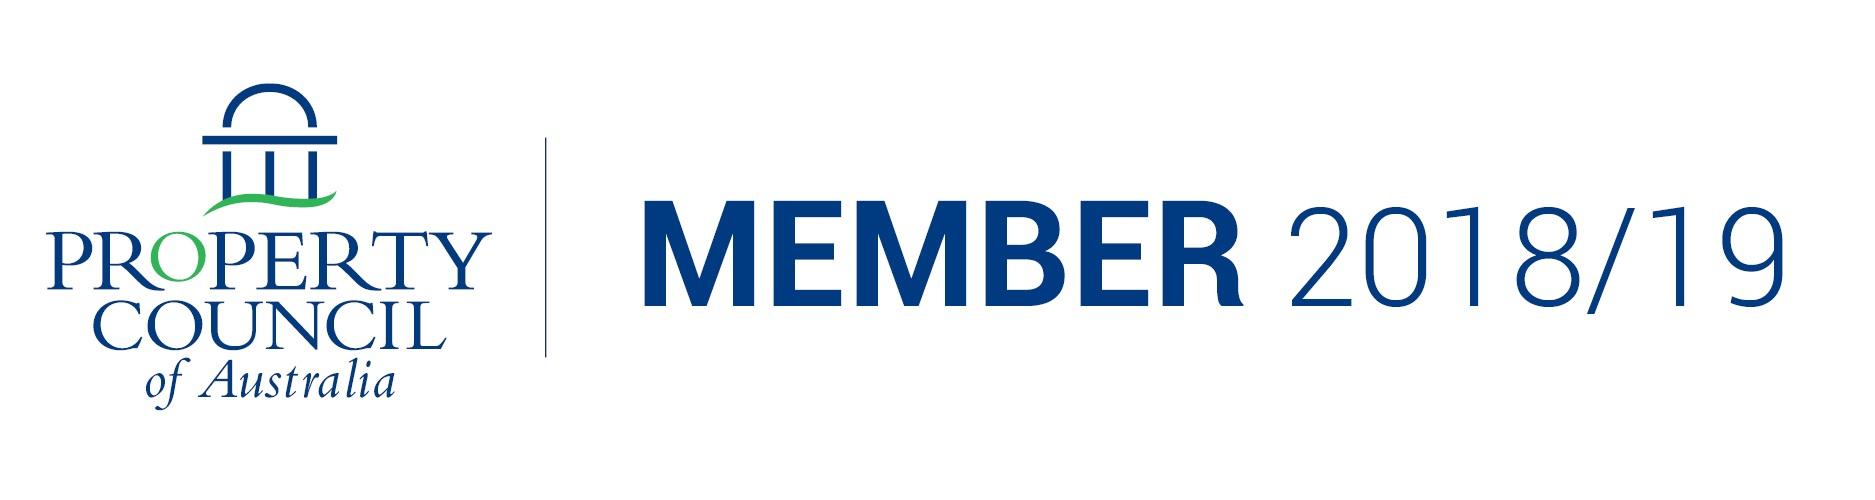 Property Council of Australia - Member 2018/19